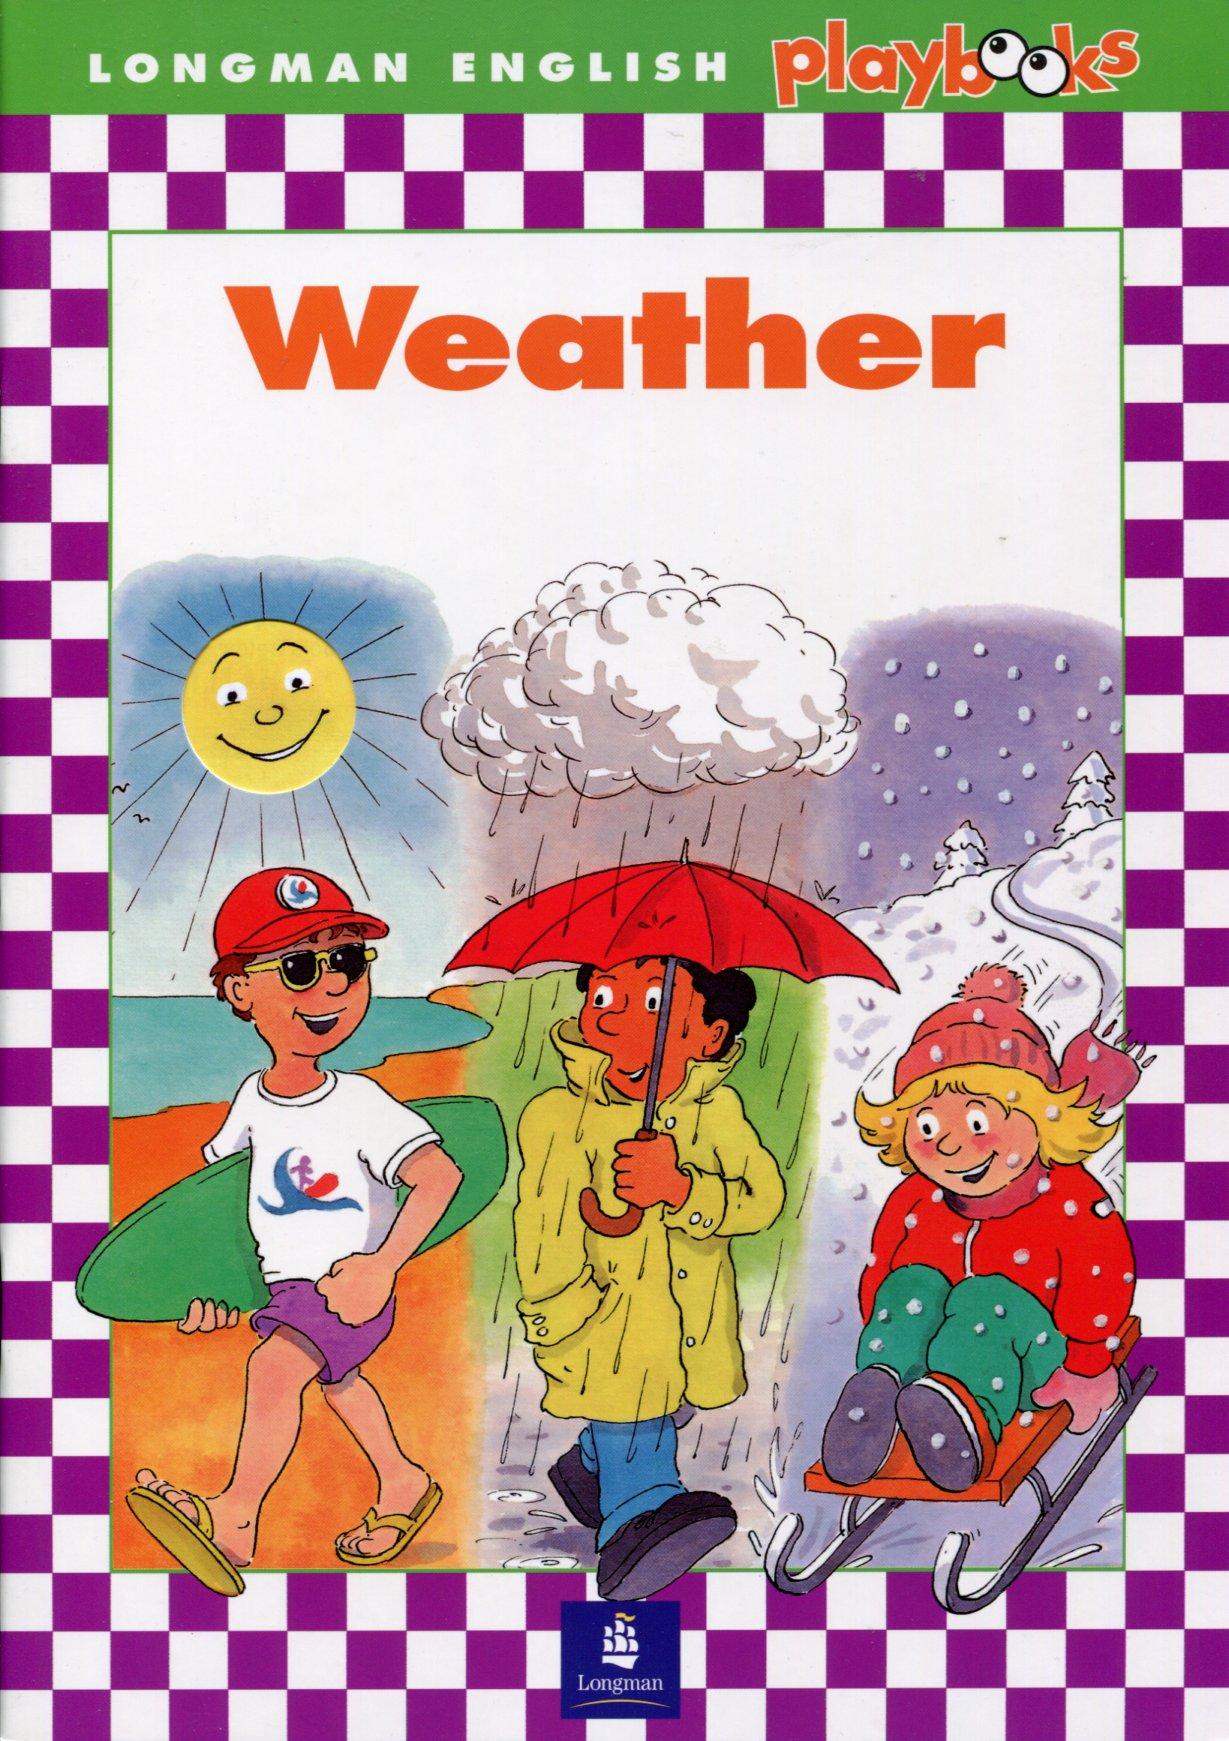 Longman English Playbooks: Weather